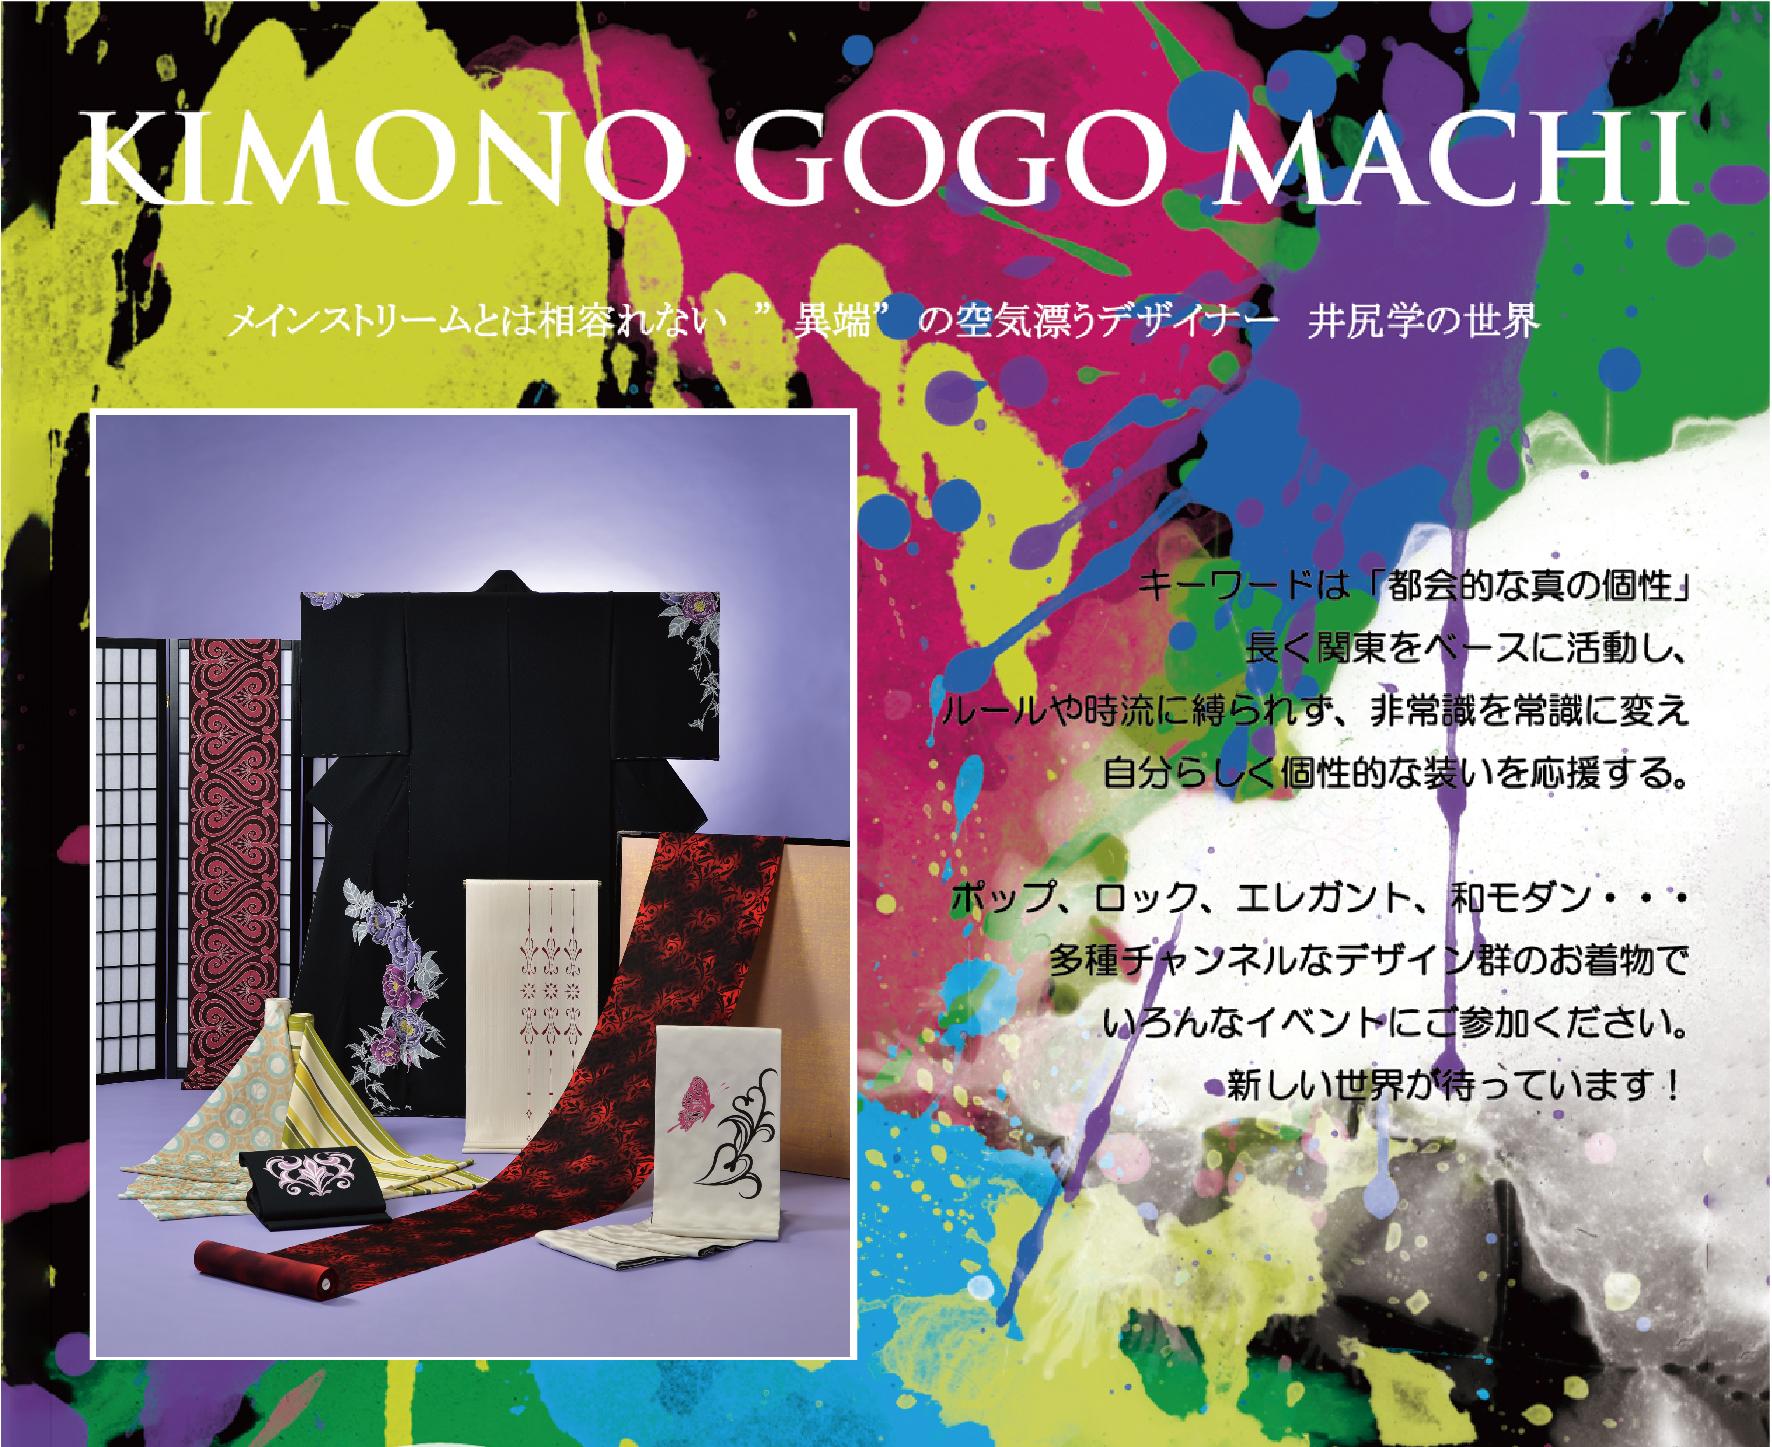 【徳山店】8月展示 KIMONO GOGO MACHI